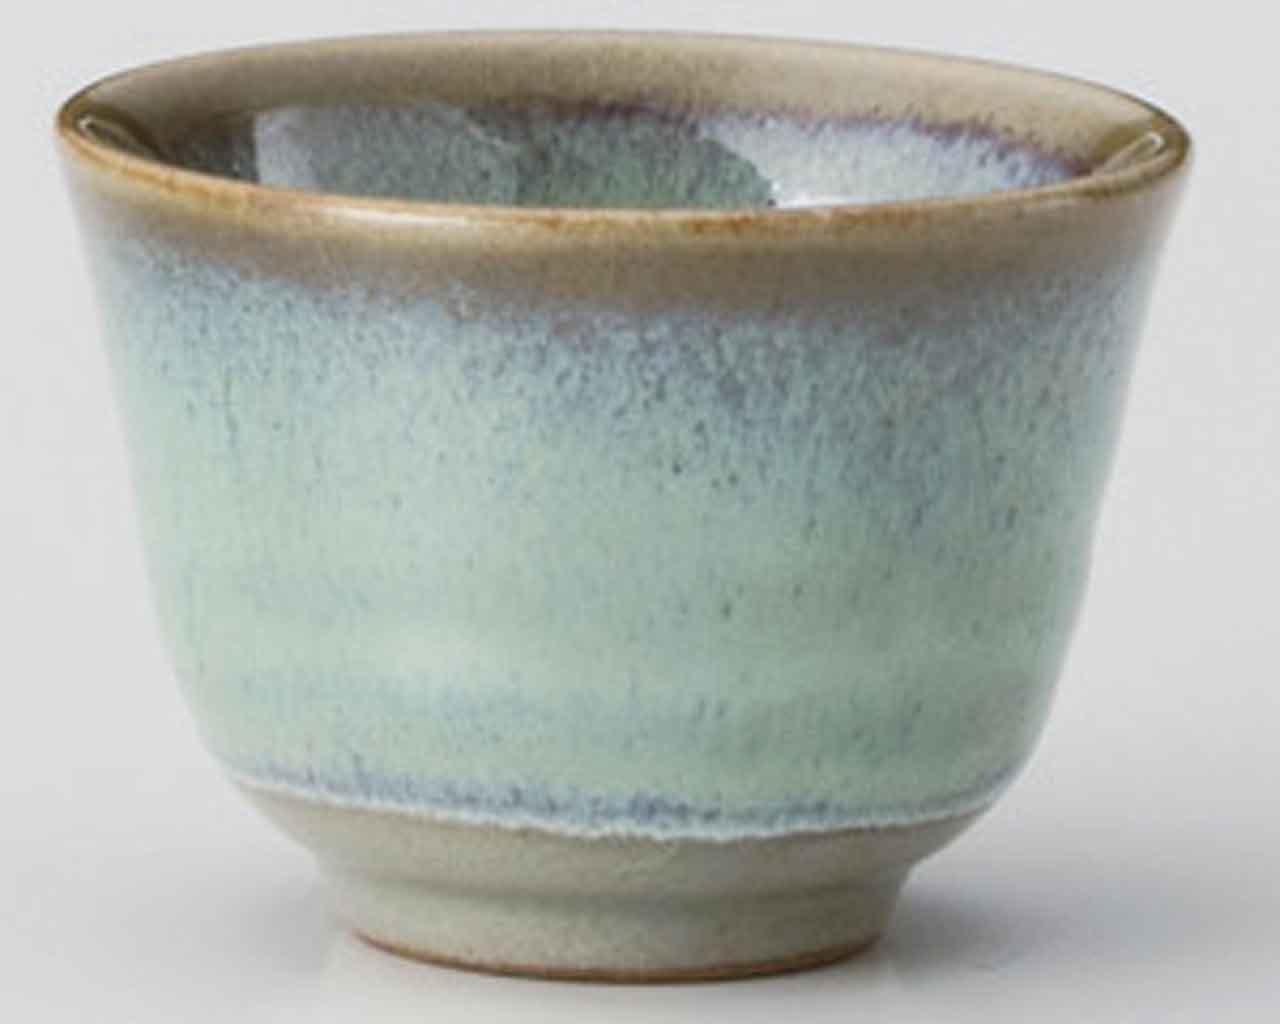 Hiwa Green 8.2cm Japanese Tea Cup Green Ceramic Made in Japan watou.asia